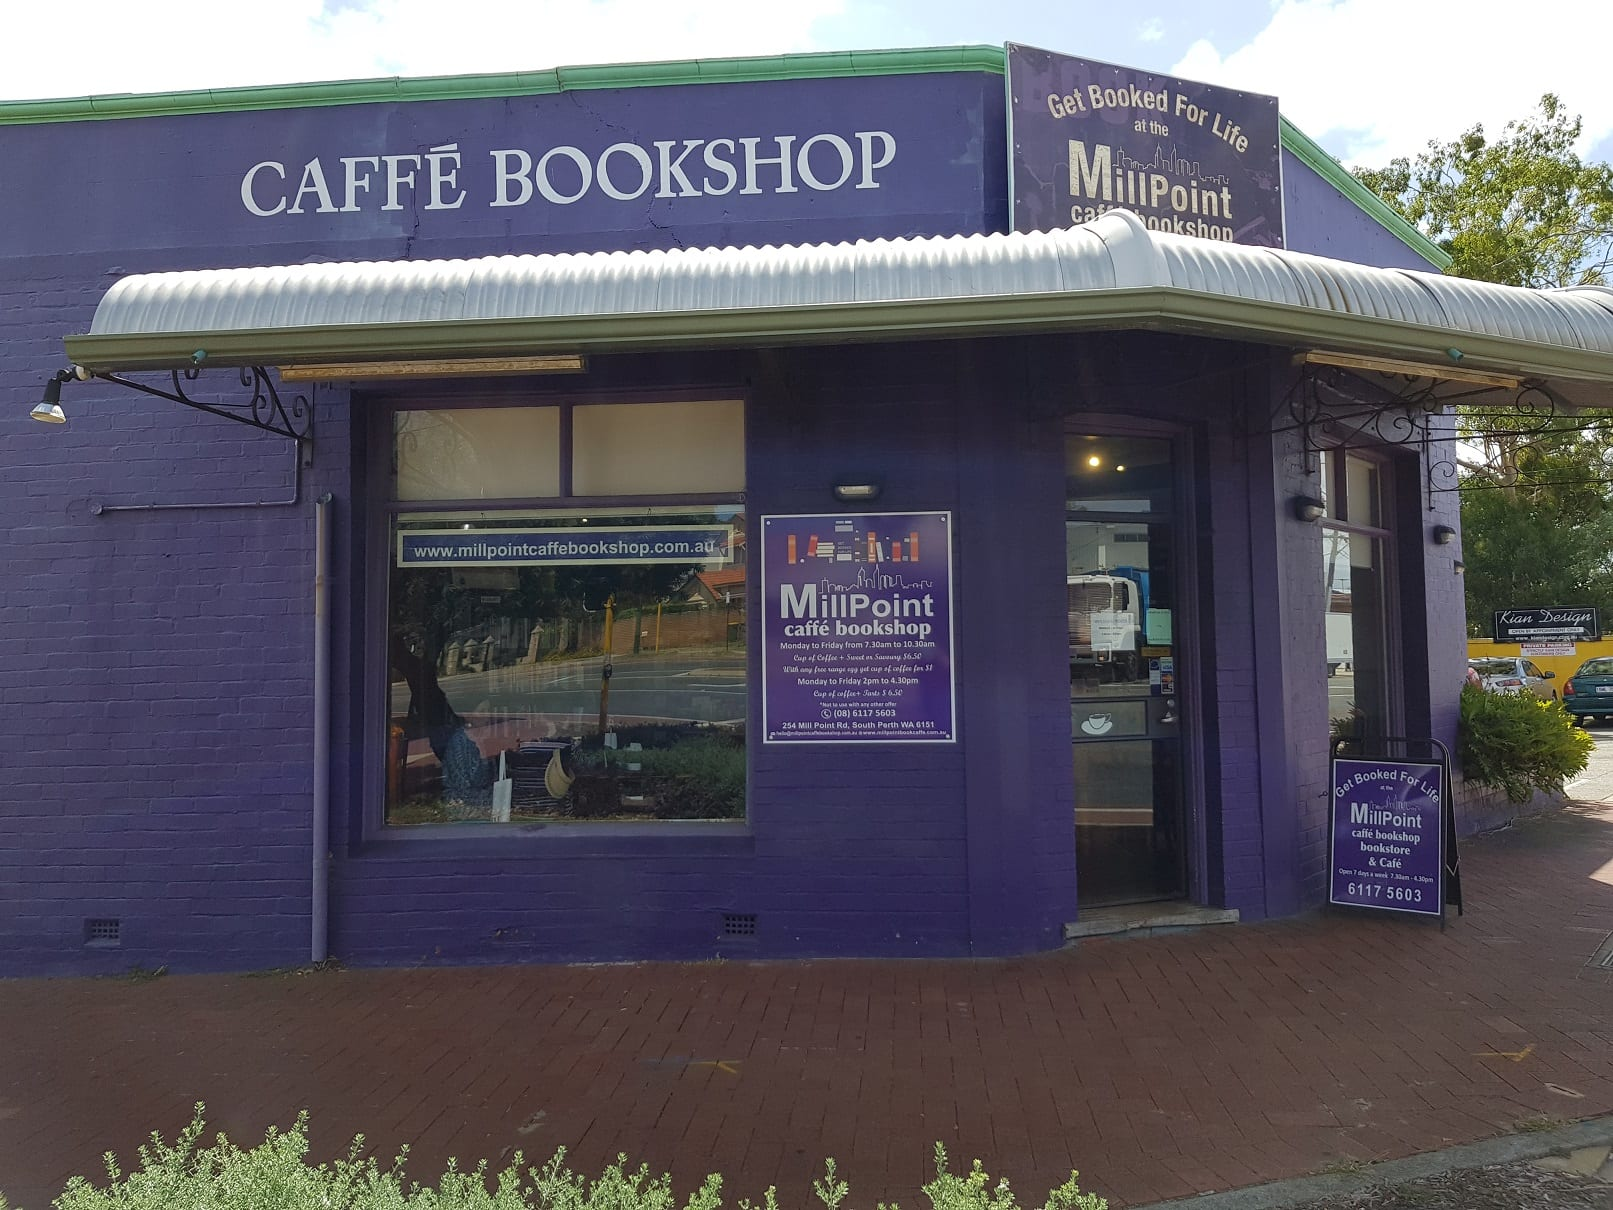 Millpoint Caffe Bookshop, South Perth